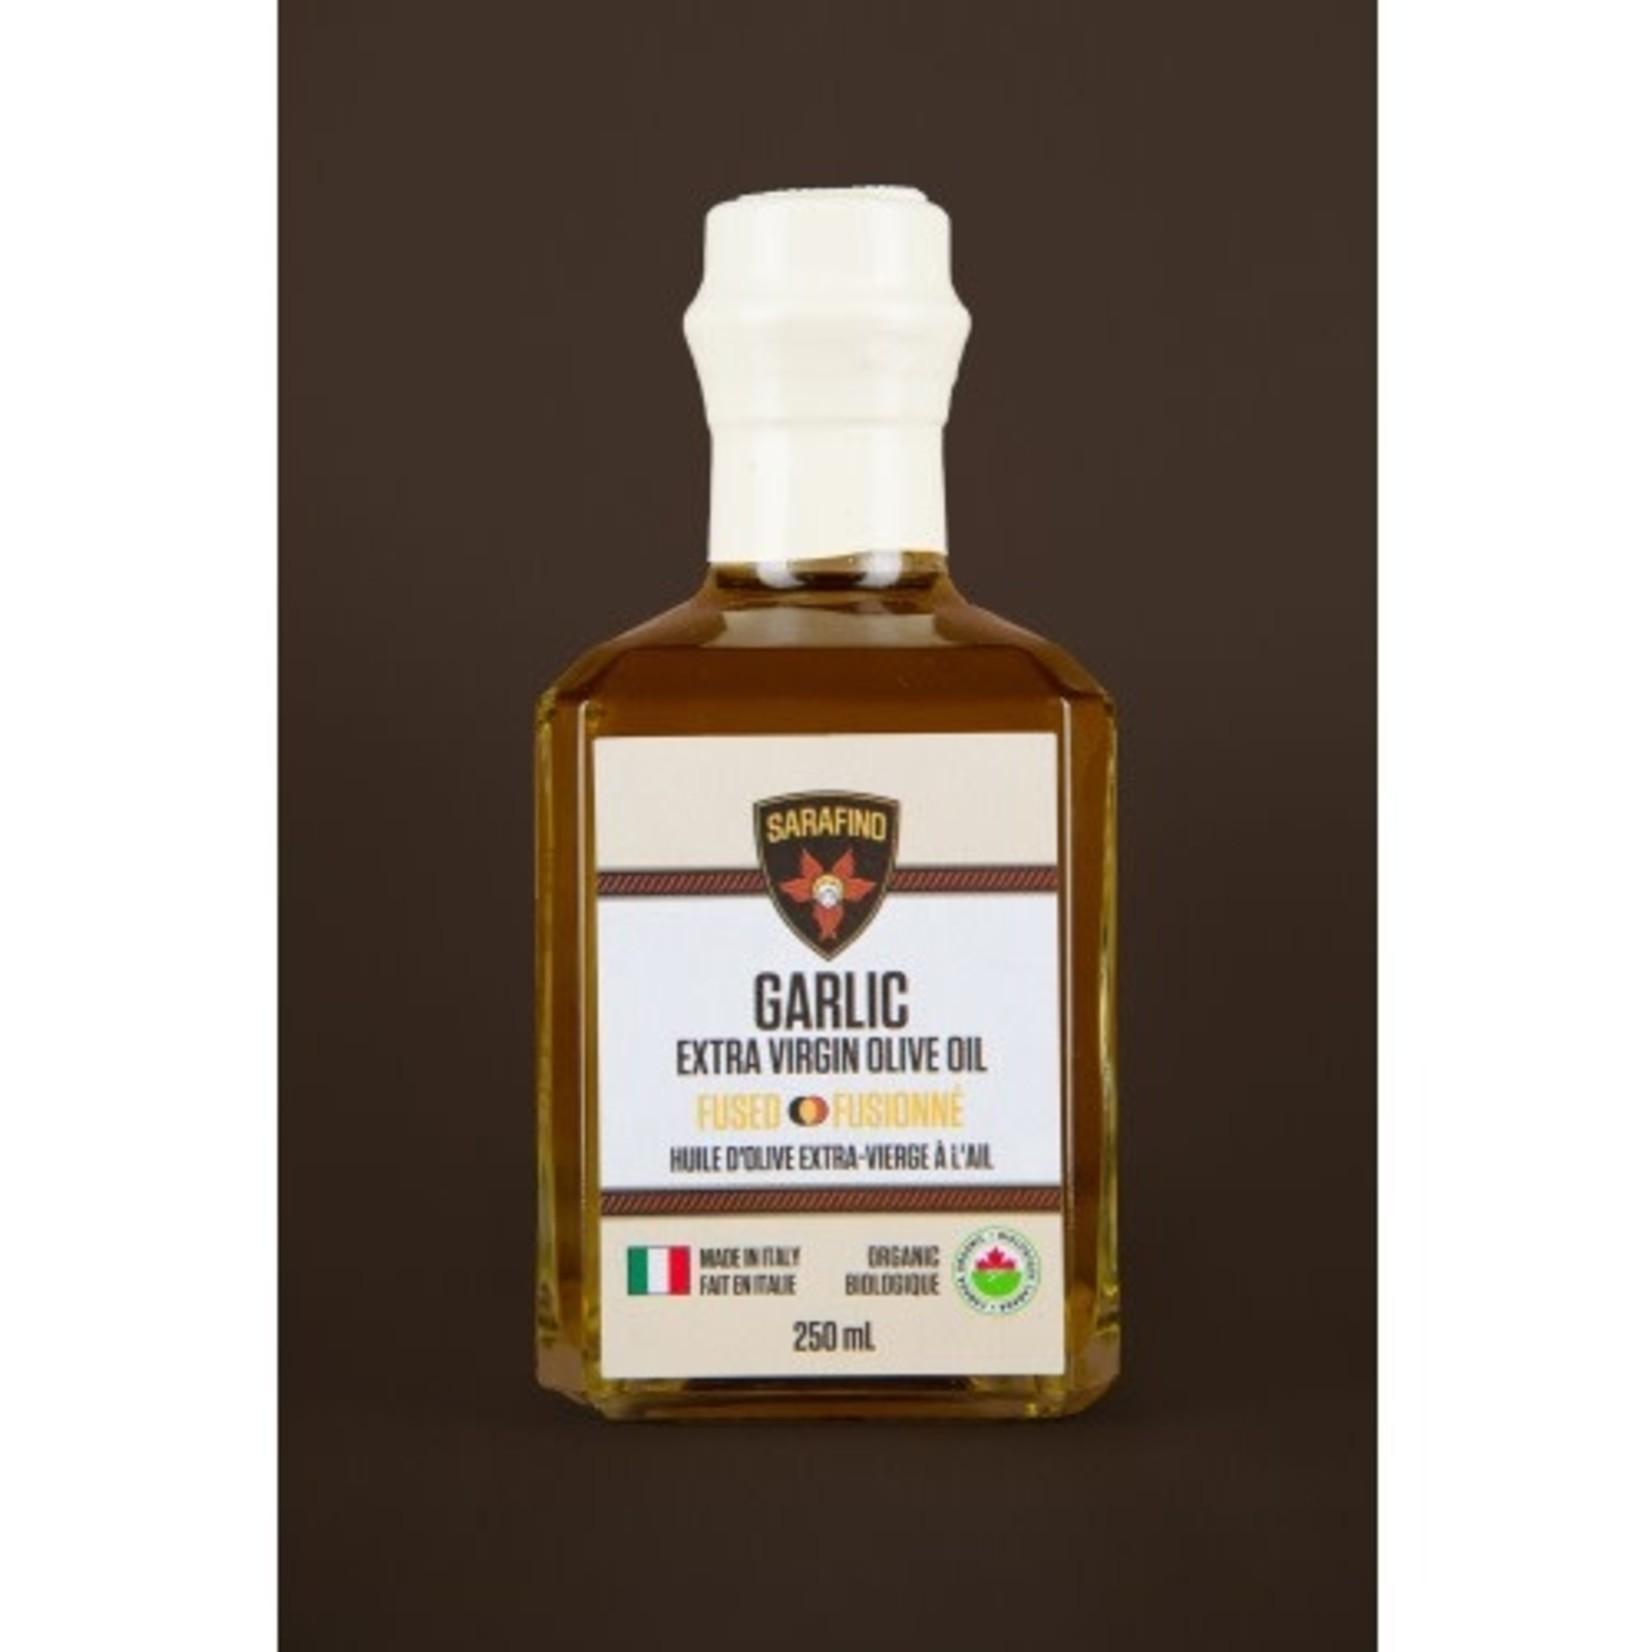 Sarafino Inc. Garlic Fused EVOO 250ml